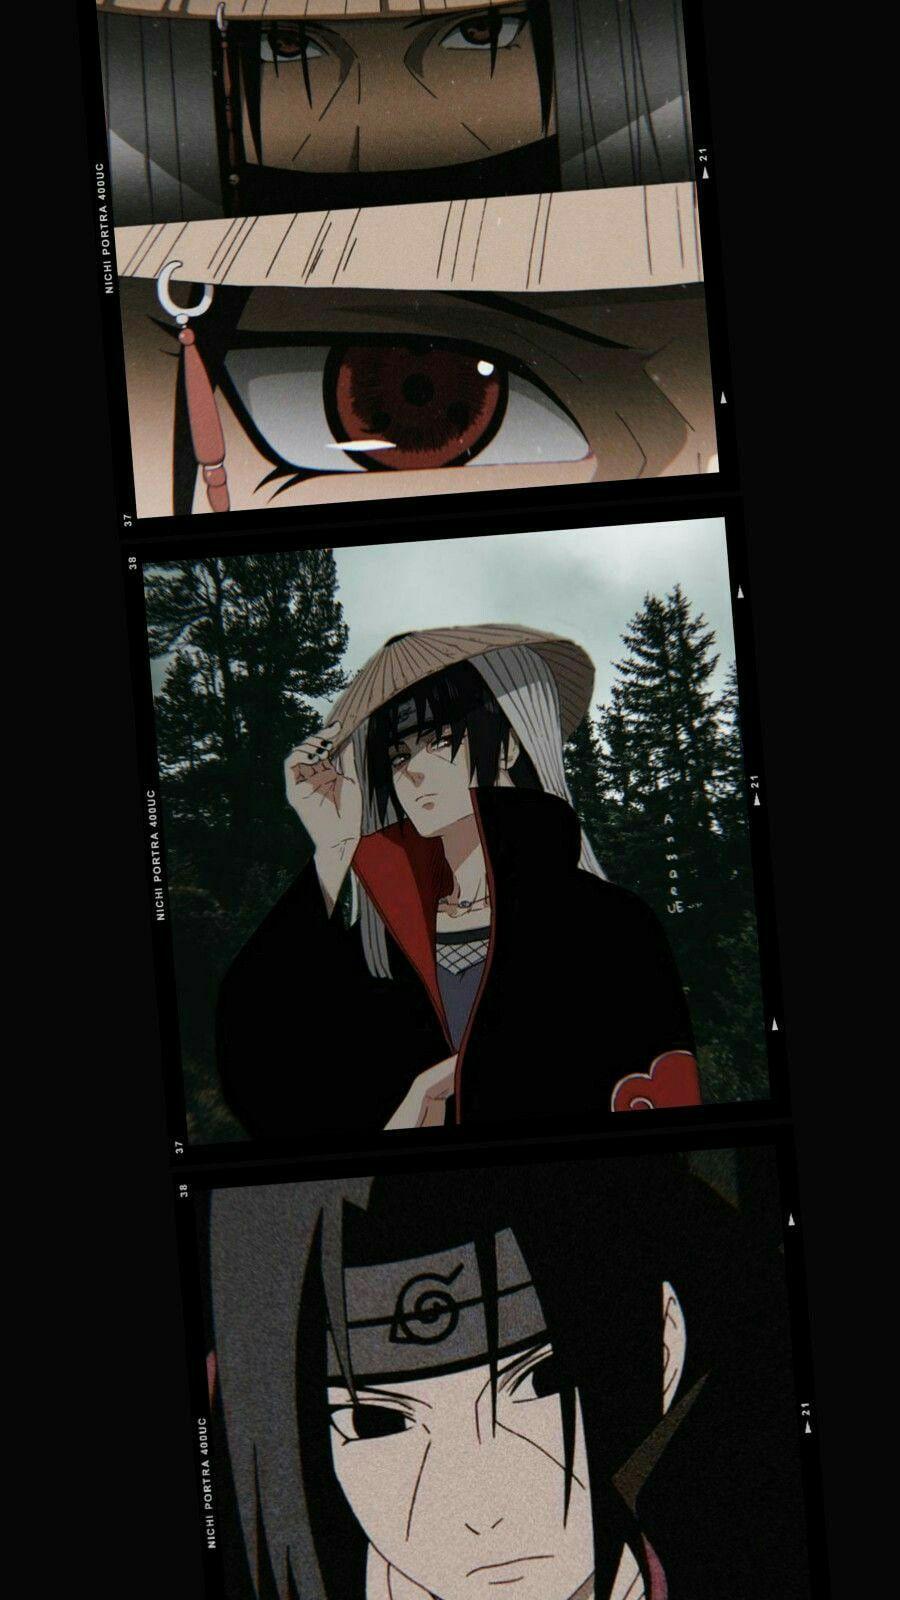 Itachi Animebackgrounds Animeclothes Animefriends Animetokyoghoul Itachi In 2020 Itachi Uchiha Itachi Uchiha Art Naruto Shippuden Sasuke